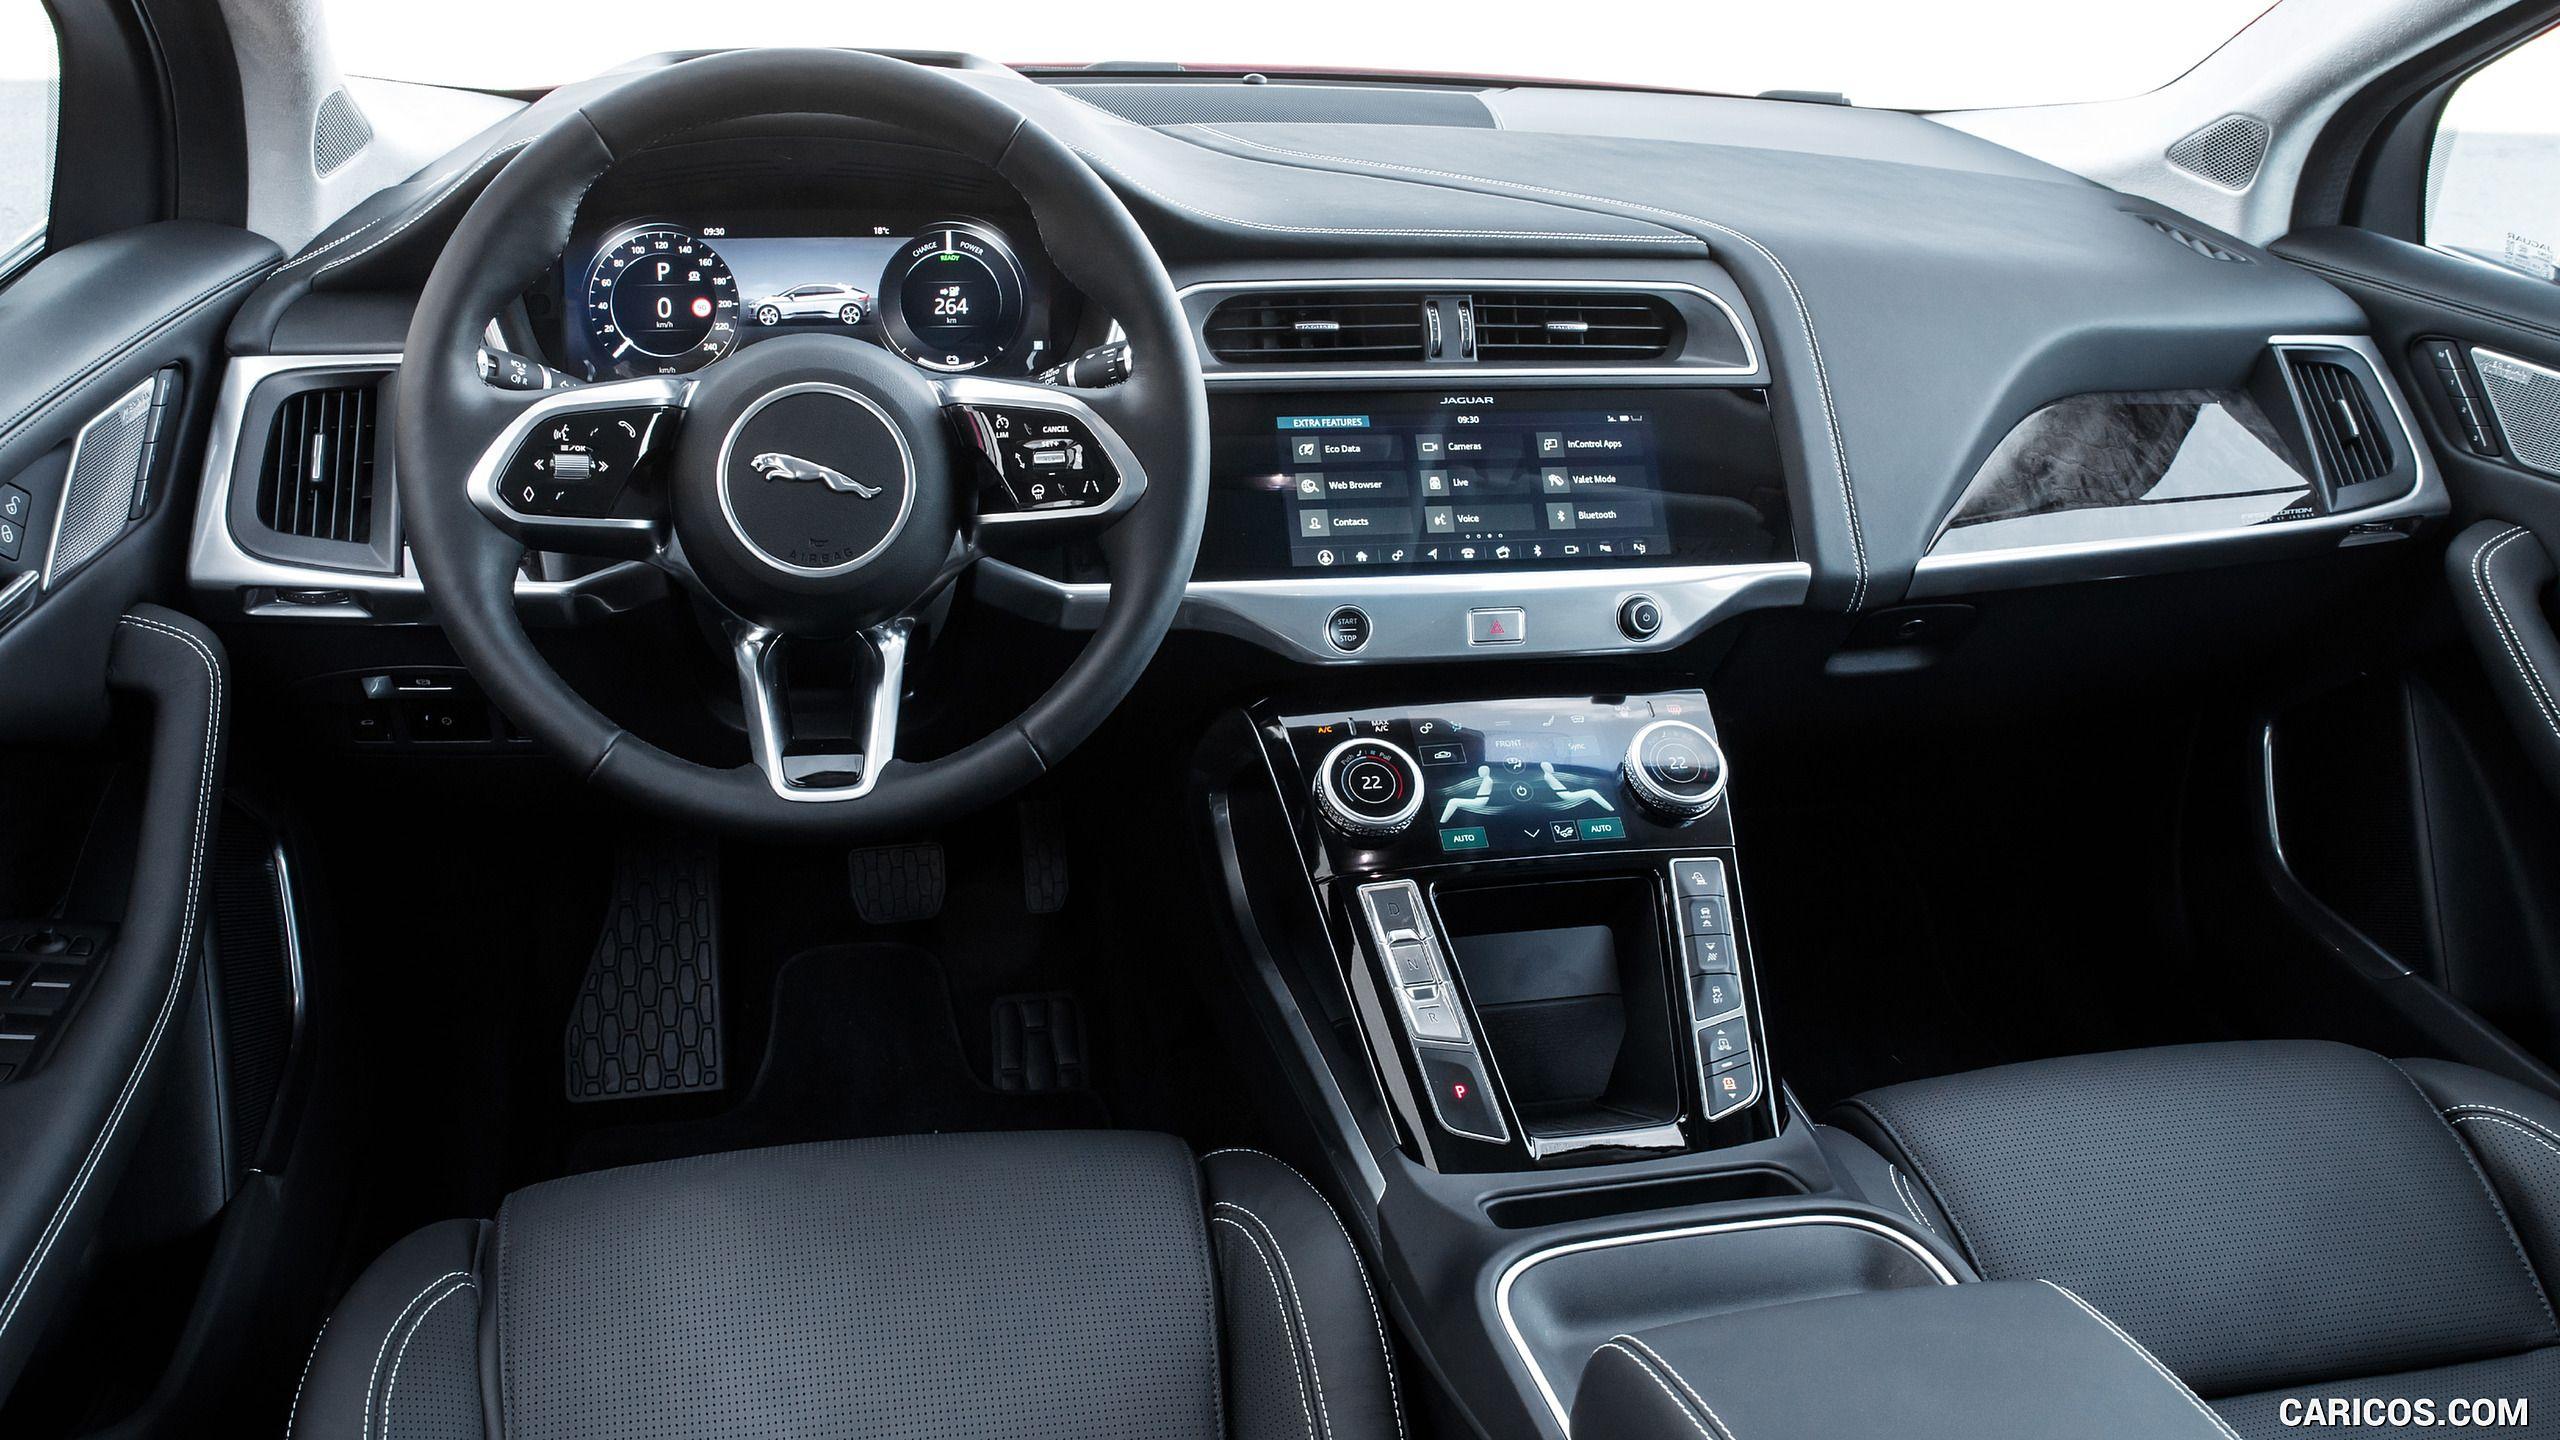 Pin By Brianna Davis On Luxury Suv In 2020 Jaguar Suv Jaguar Luxury Suv